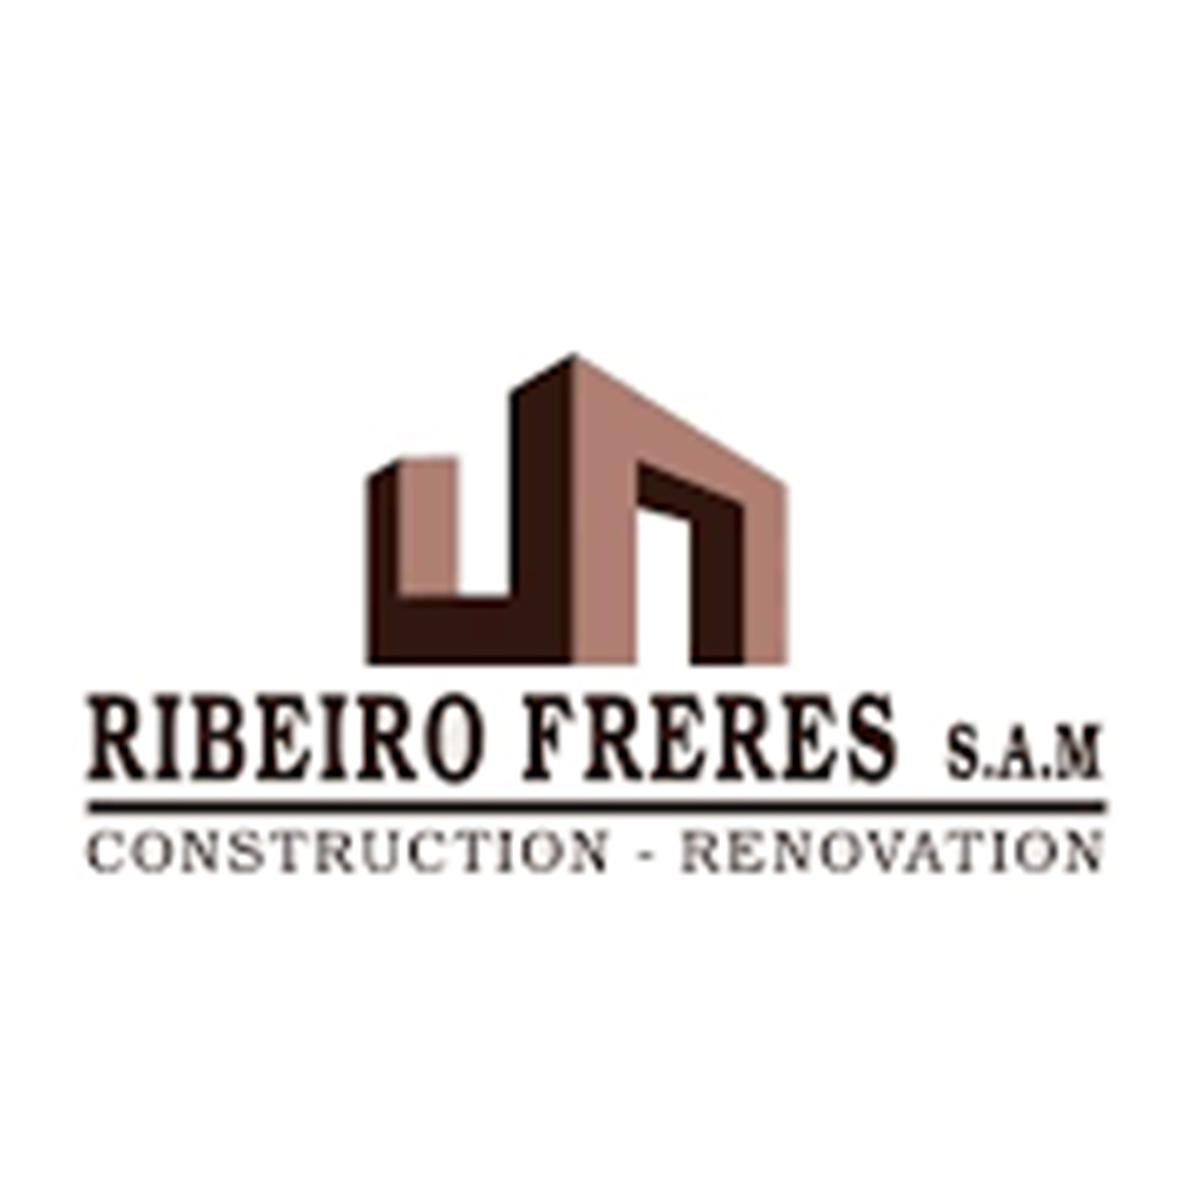 SAM RIBEIRO FRERES